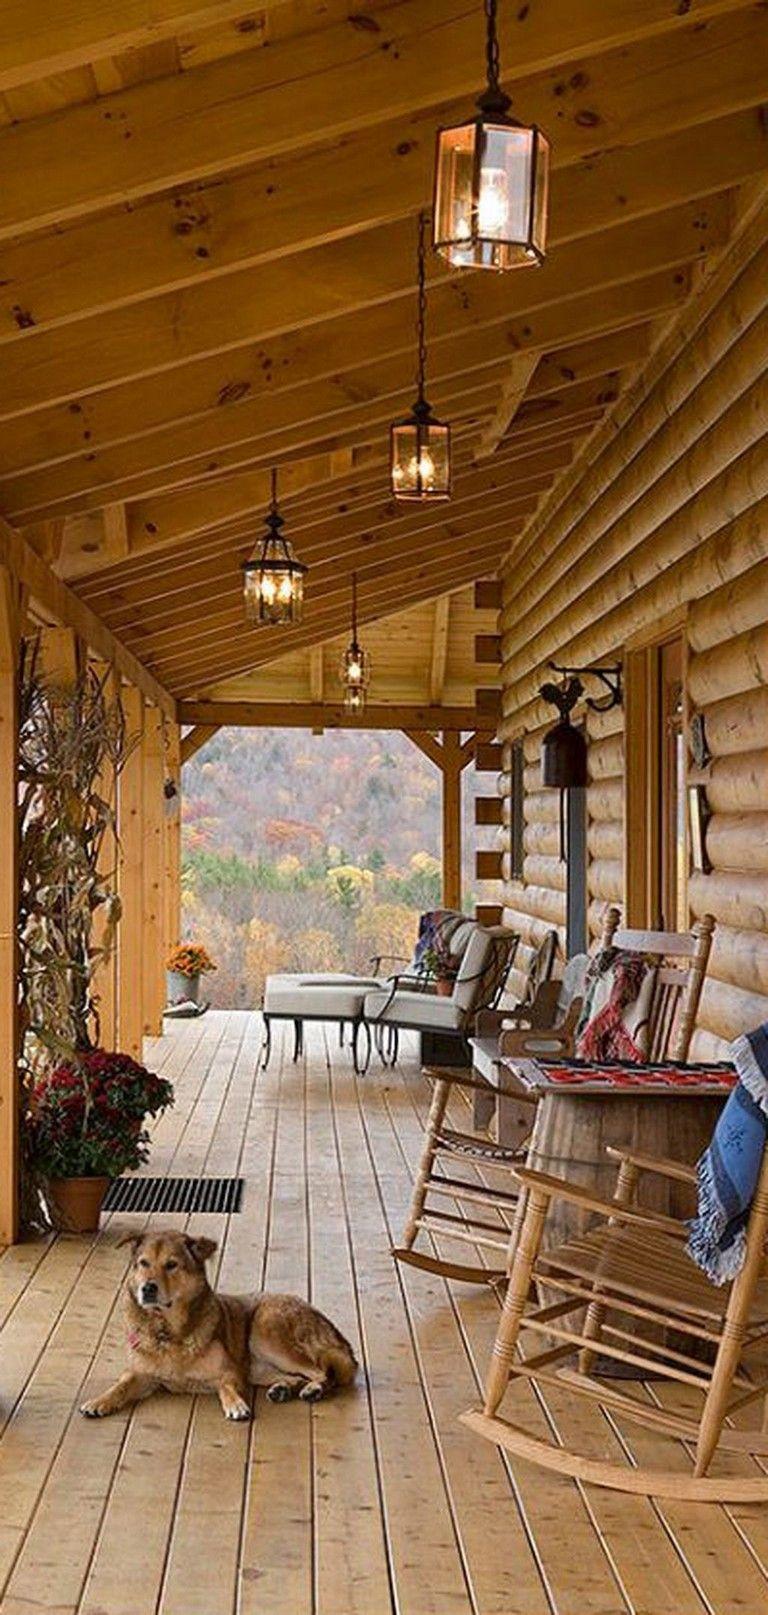 54 Marvelous Vintage Farmhouse Porch Decorating Ideas On A Budget Rustic Porch Log Home Living Log Home Designs